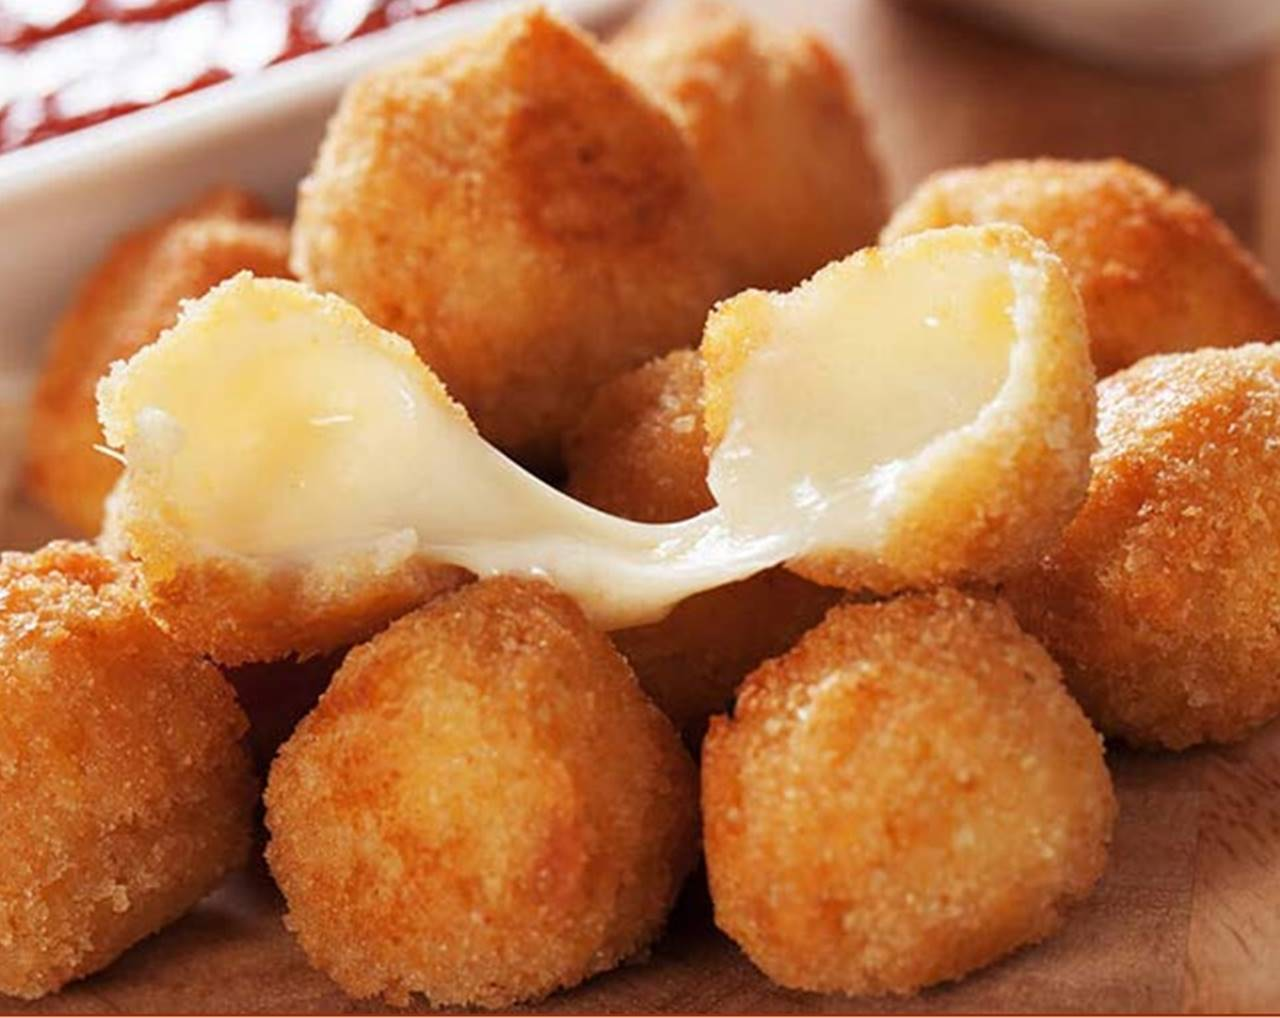 bolitas de patata rellenas con queso